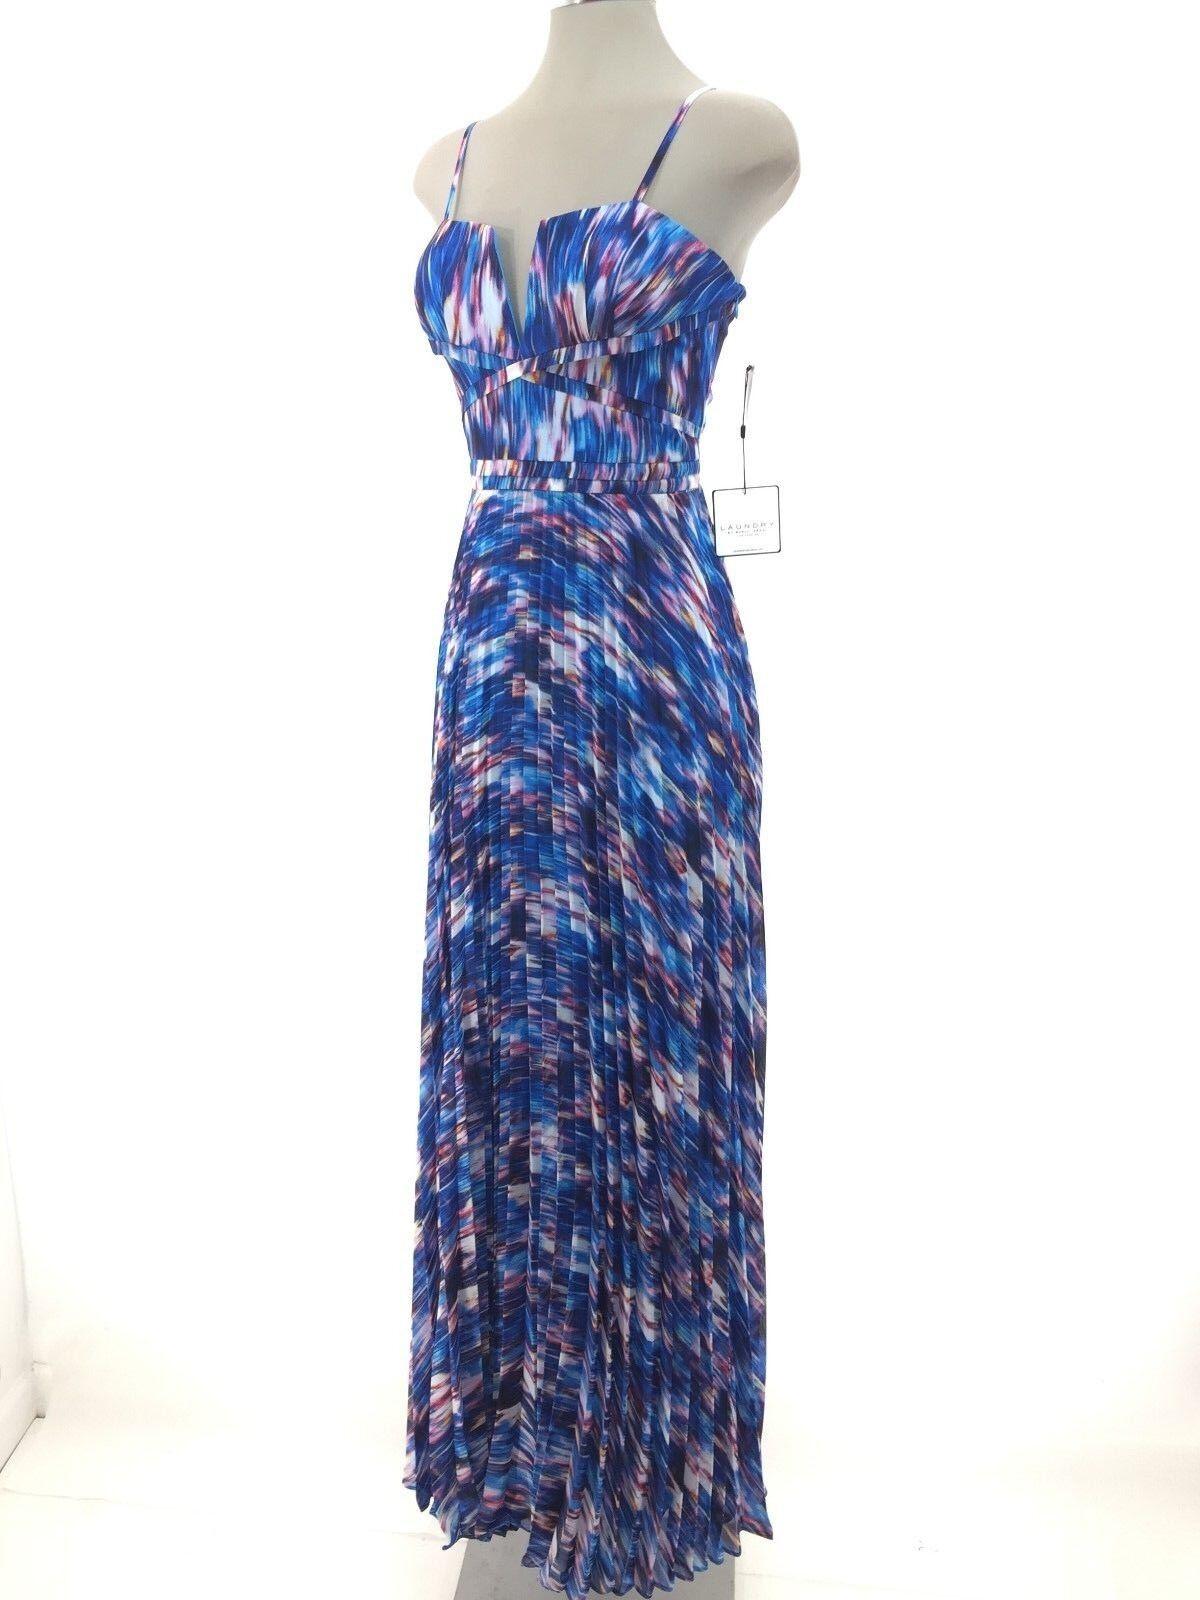 Laundry by Shelli Segal New WT Curacao Multi Beautiful Dress Pleated Größe 4, 8